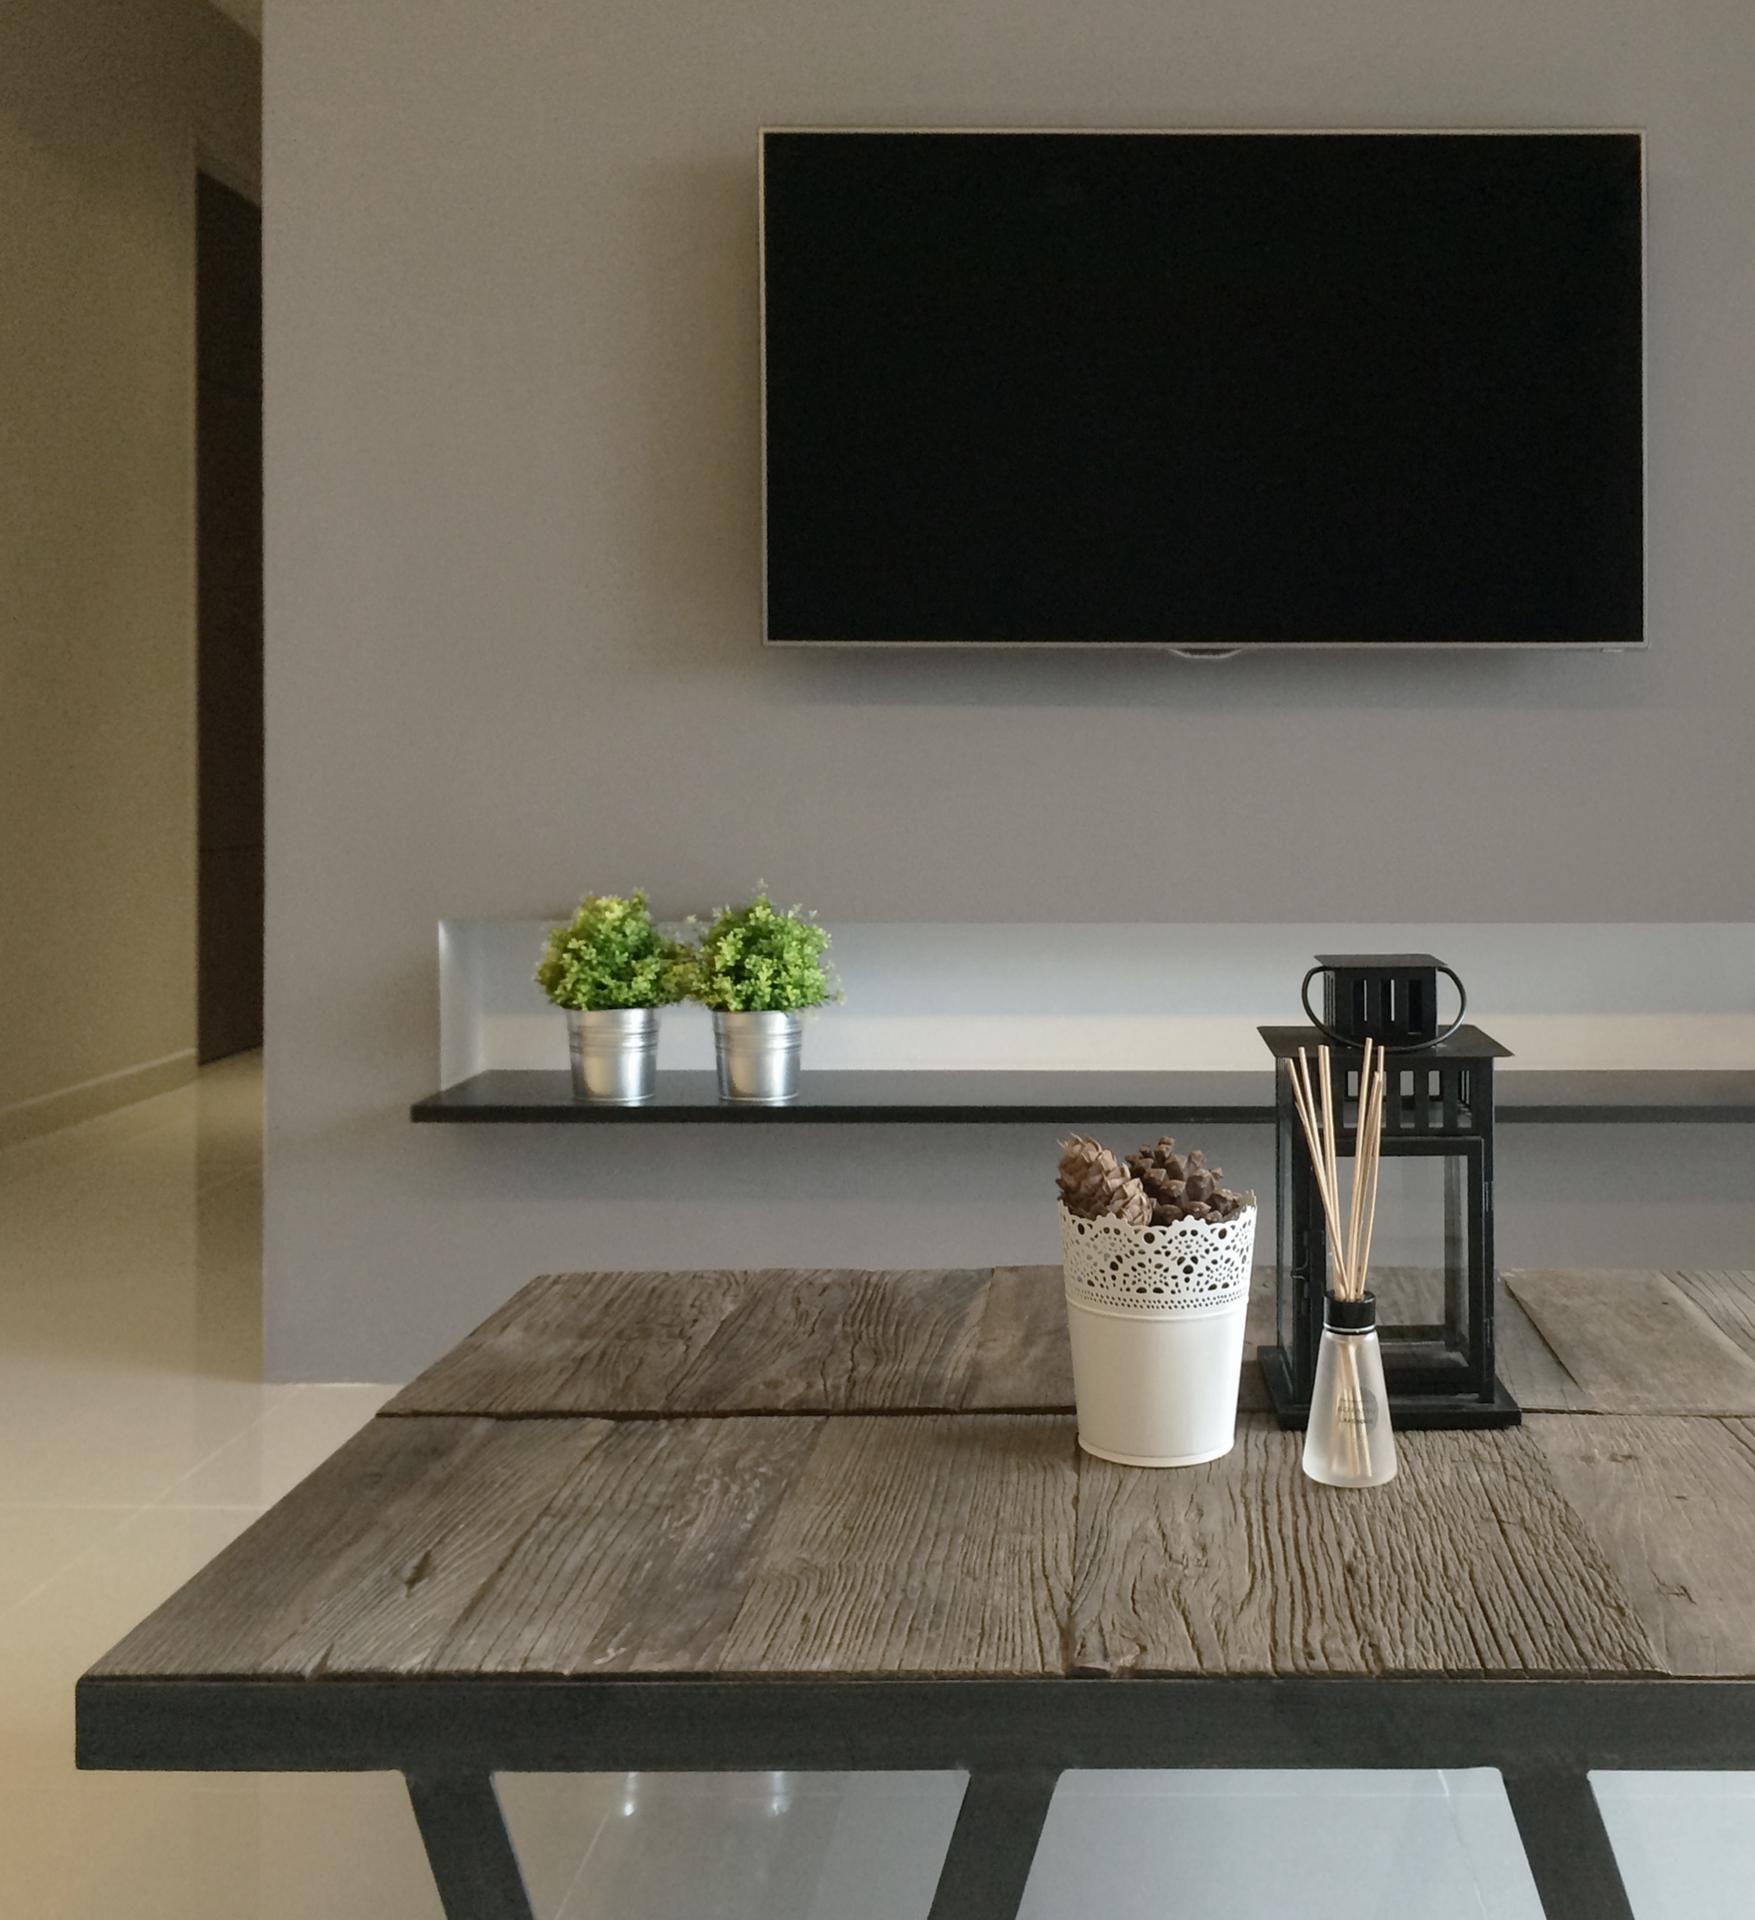 Adora Green | Qanvast | Home Design, Renovation, Remodelling & Furnishing  Ideas